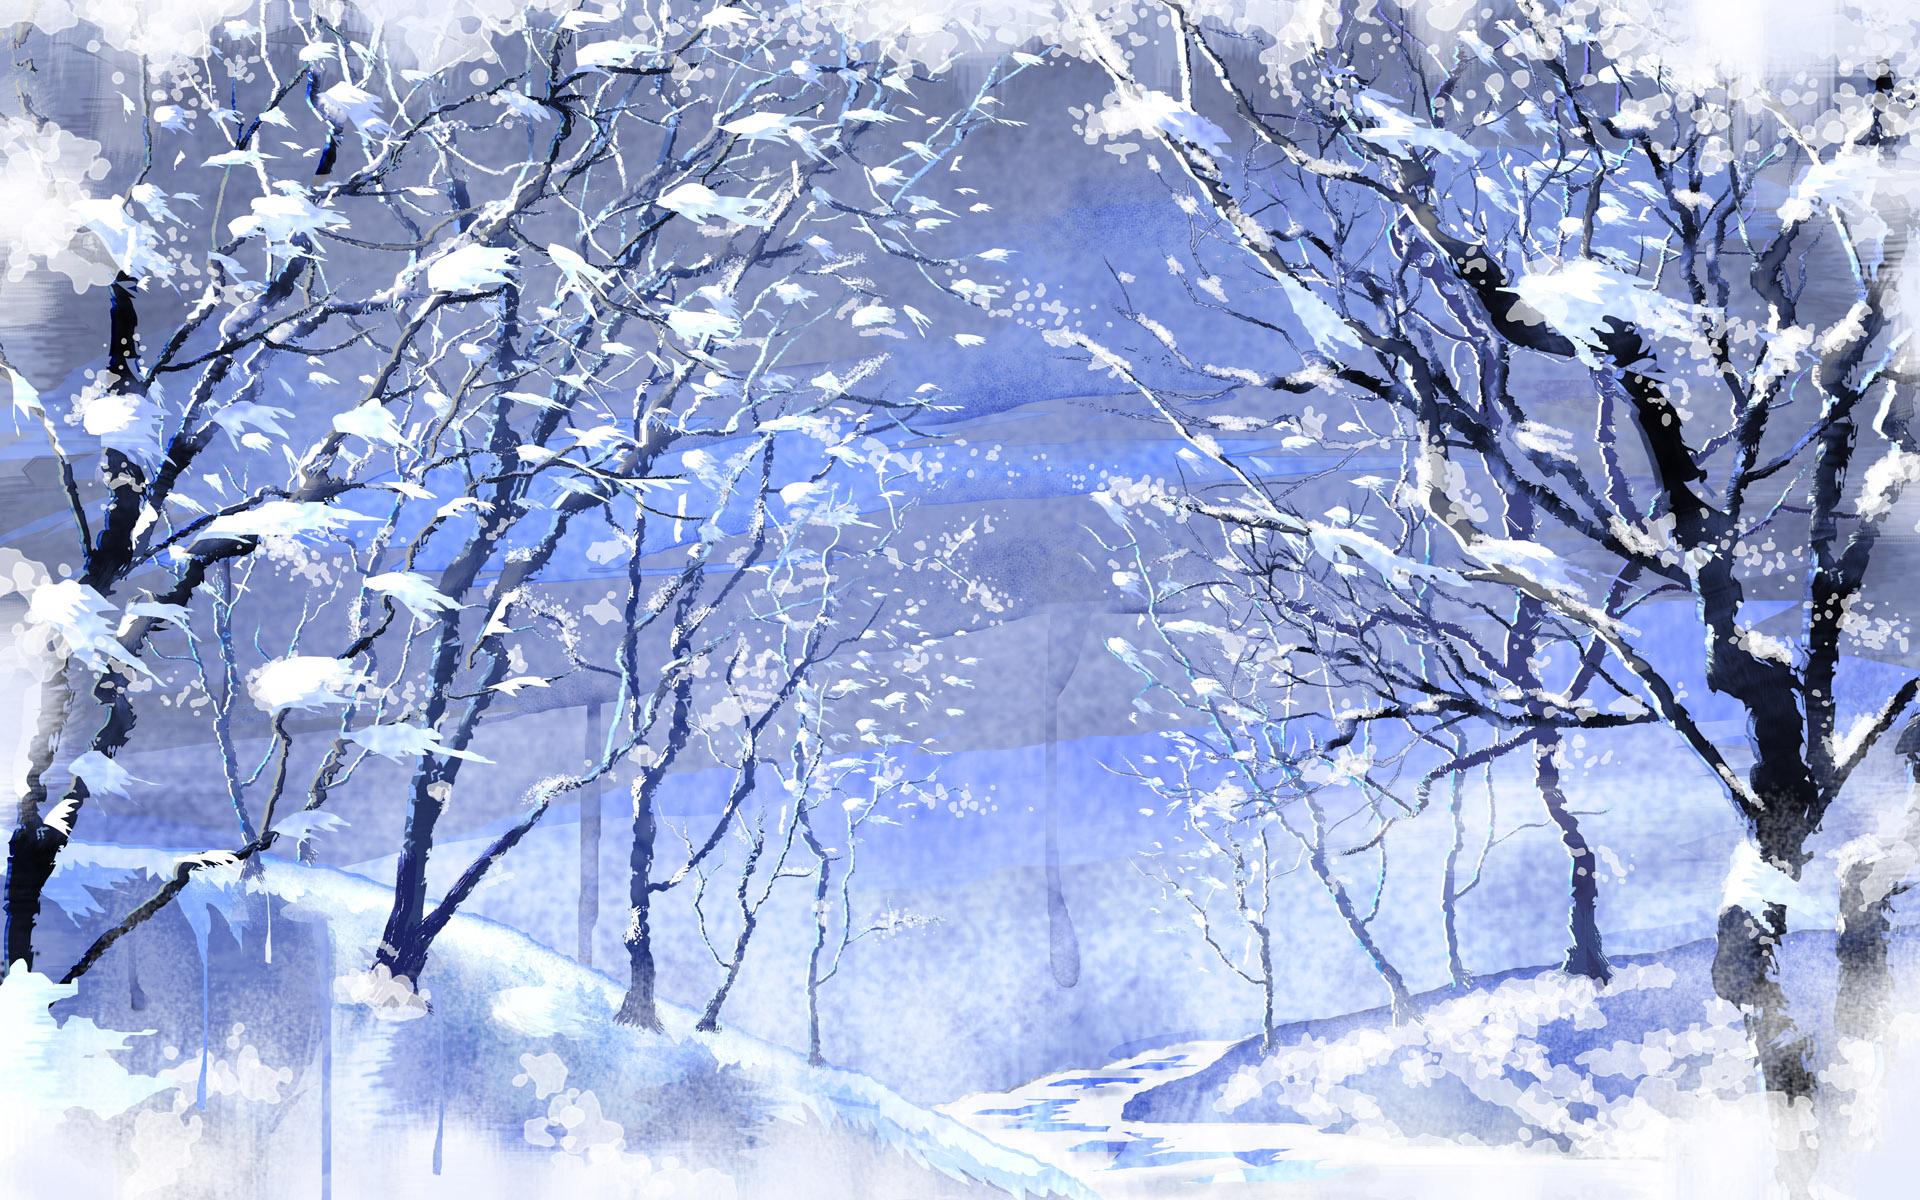 winter scene free desktop wallpaper s wallpaper s orgwallpapers diq 1920x1200